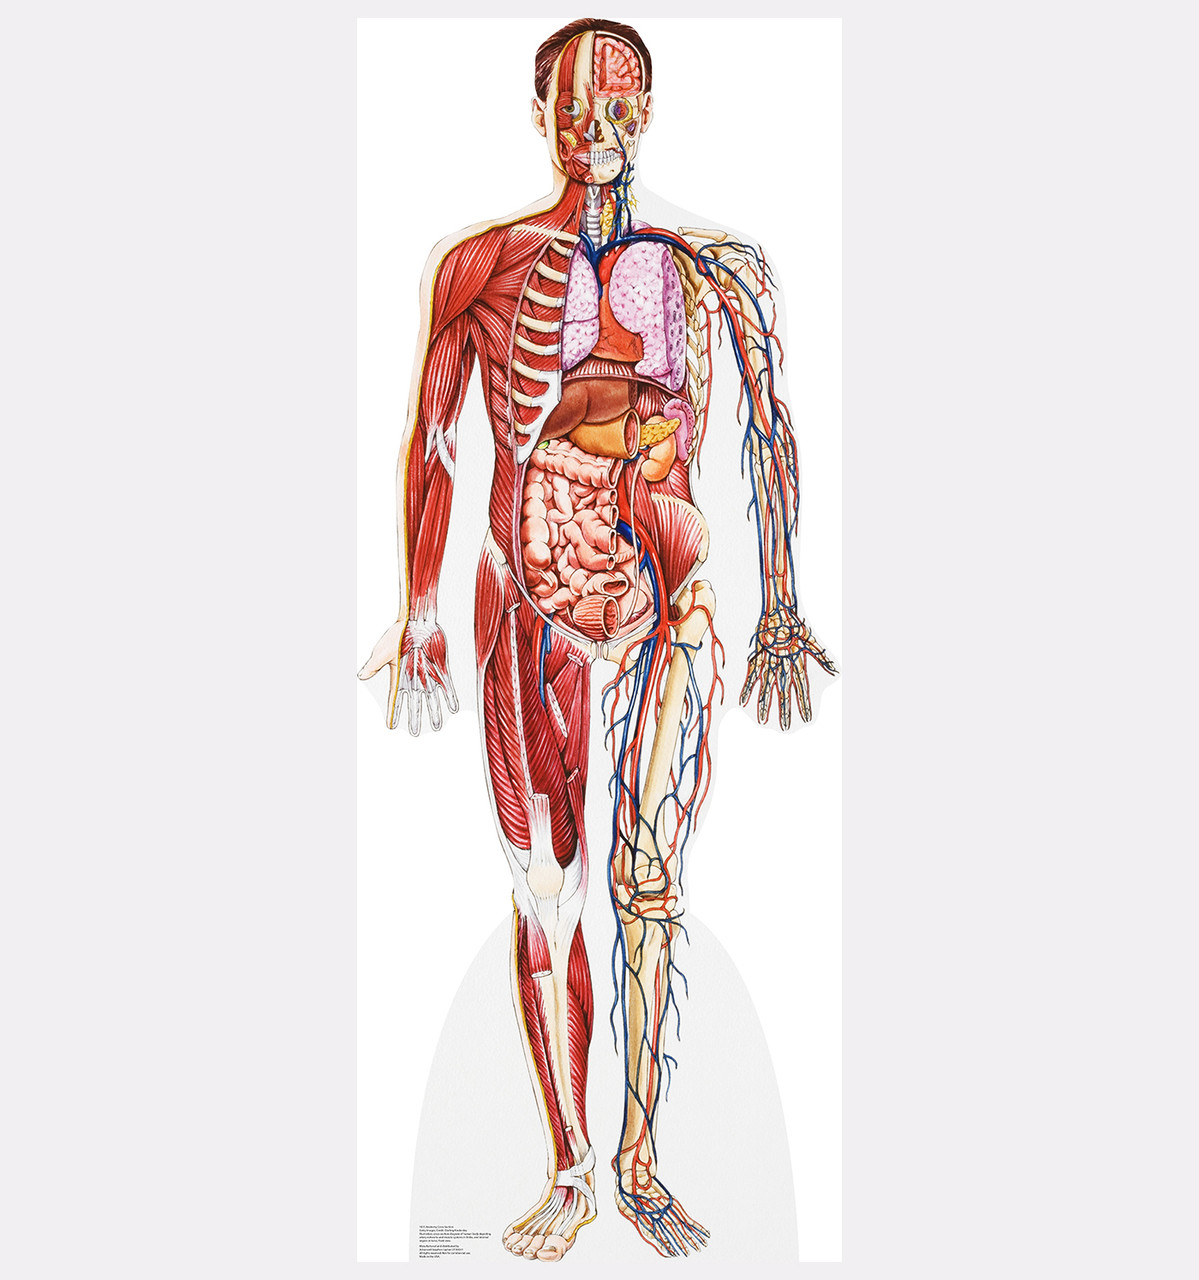 Life-size Anatomy - Half Muscle Half Skeleton Cardboard Standup ...